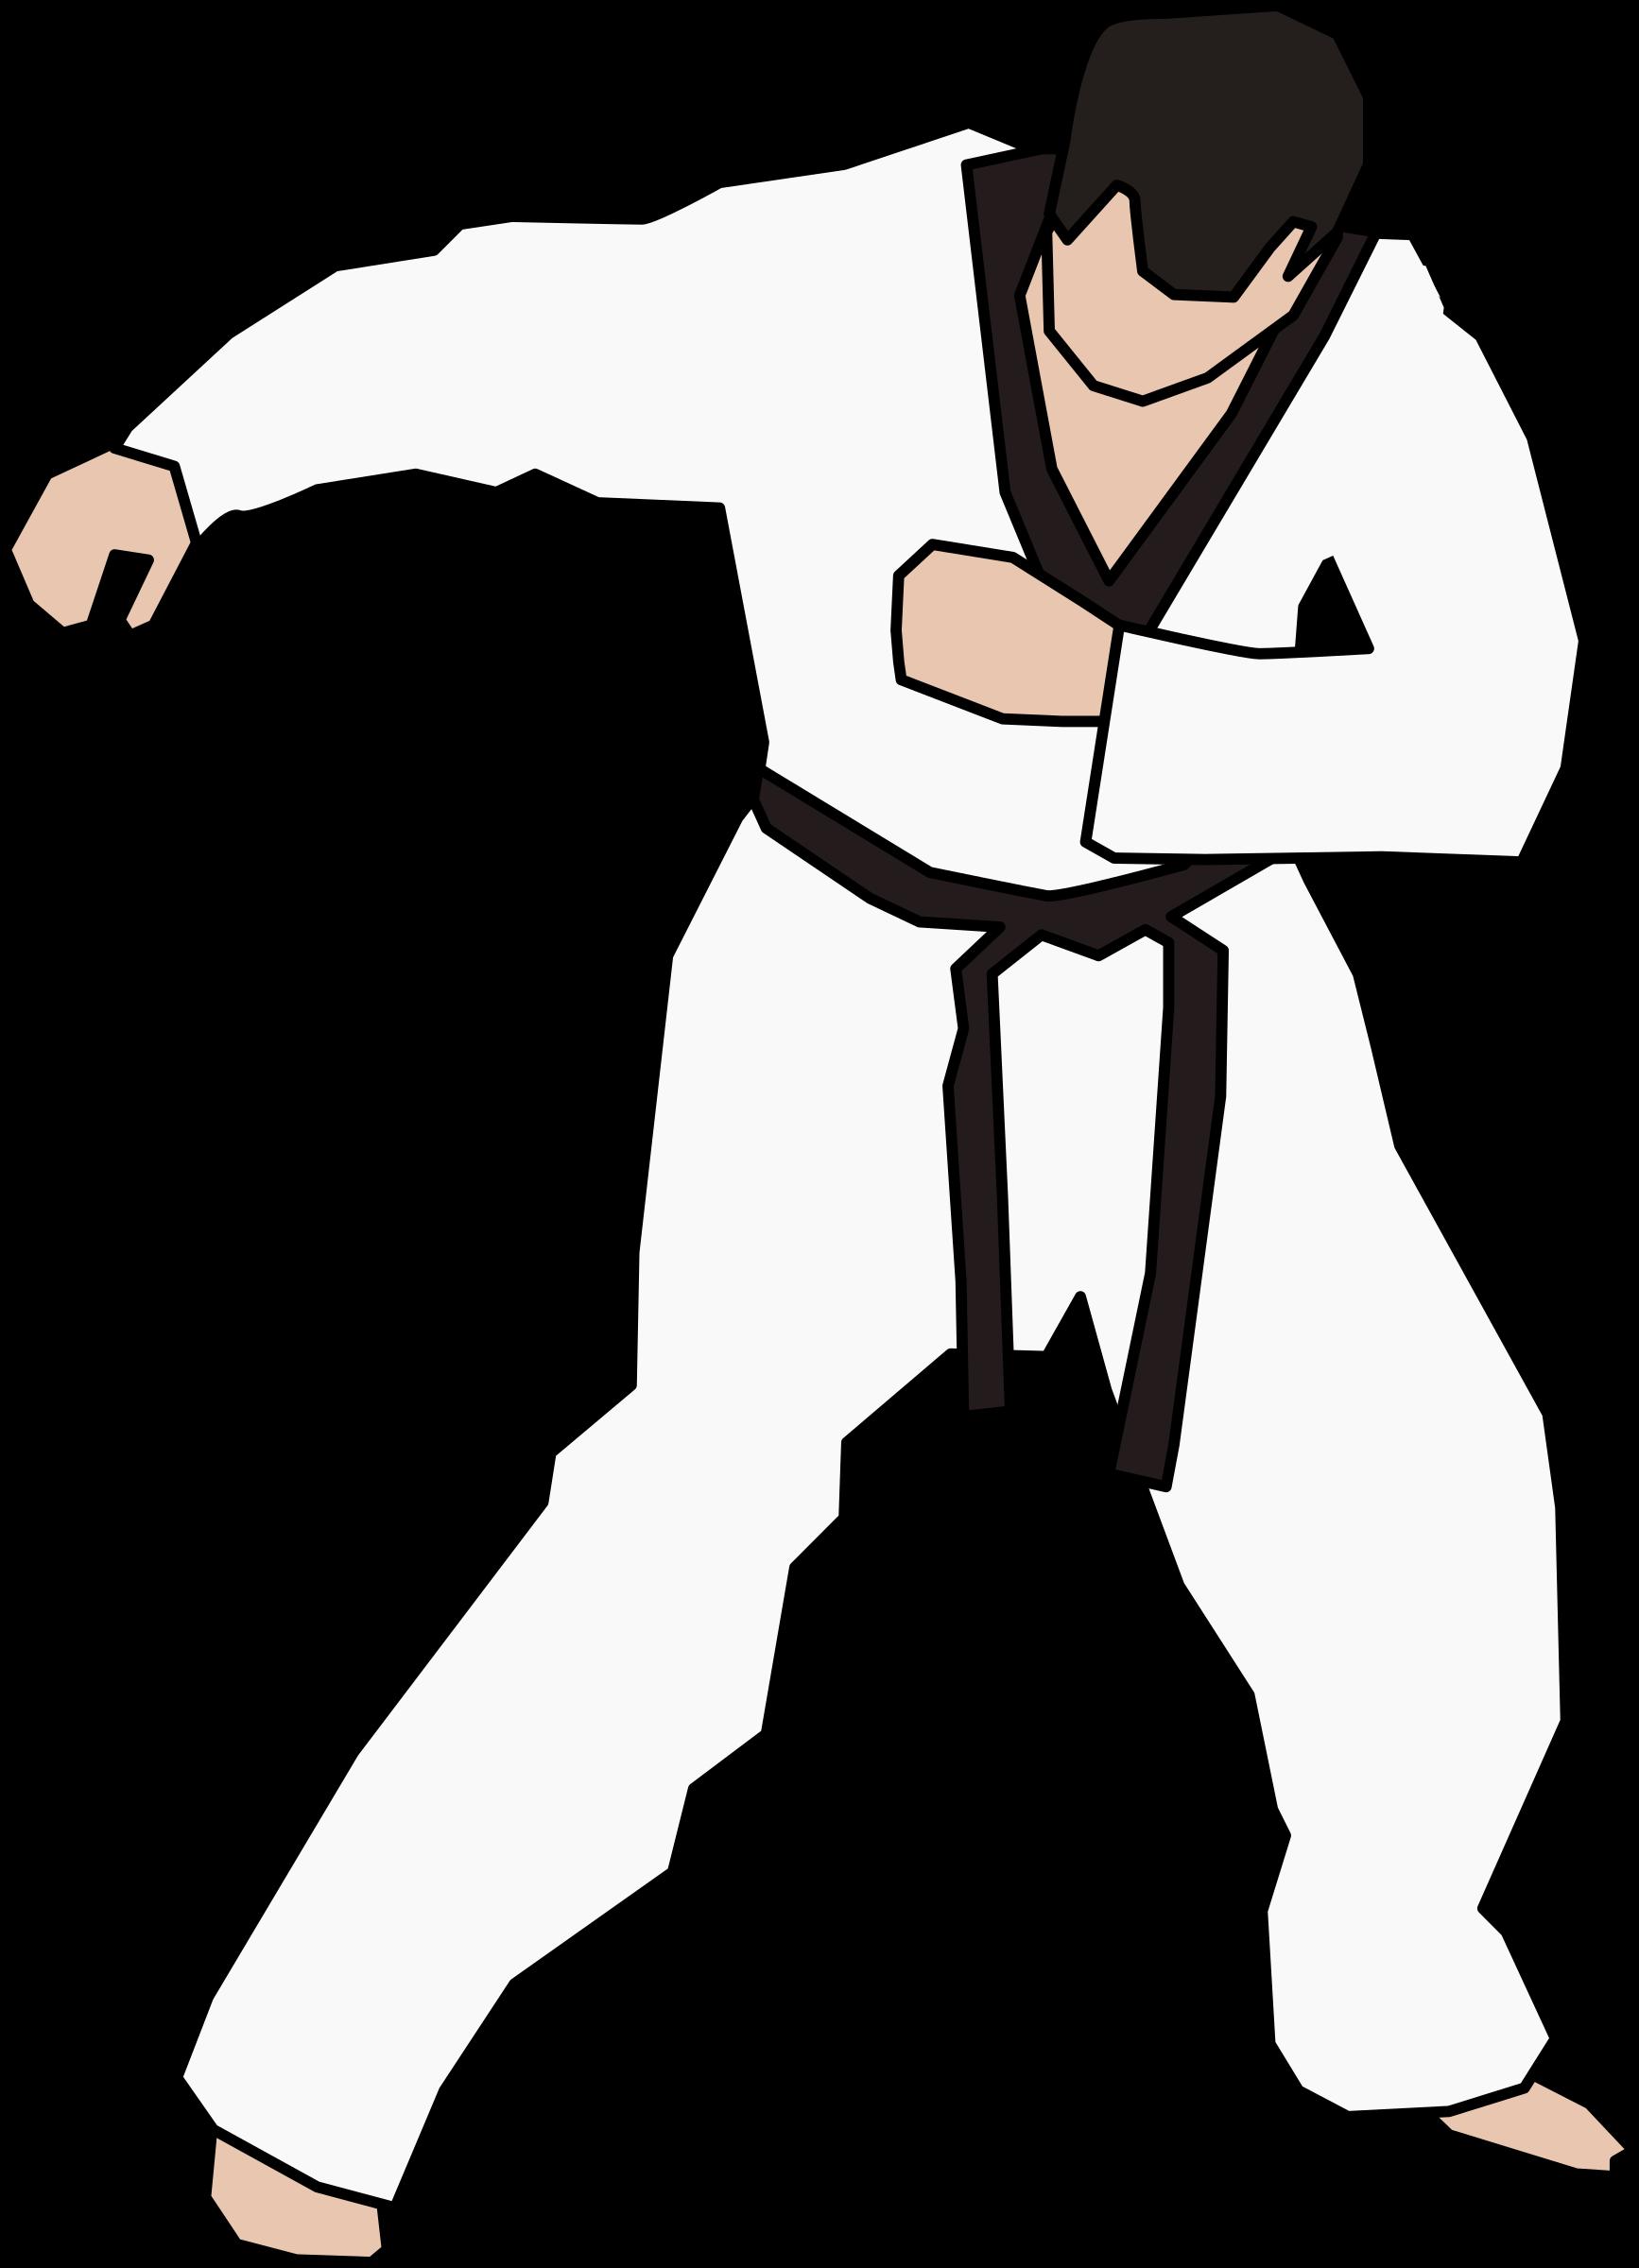 jpg freeuse stock Fighter big image png. Taekwondo clipart